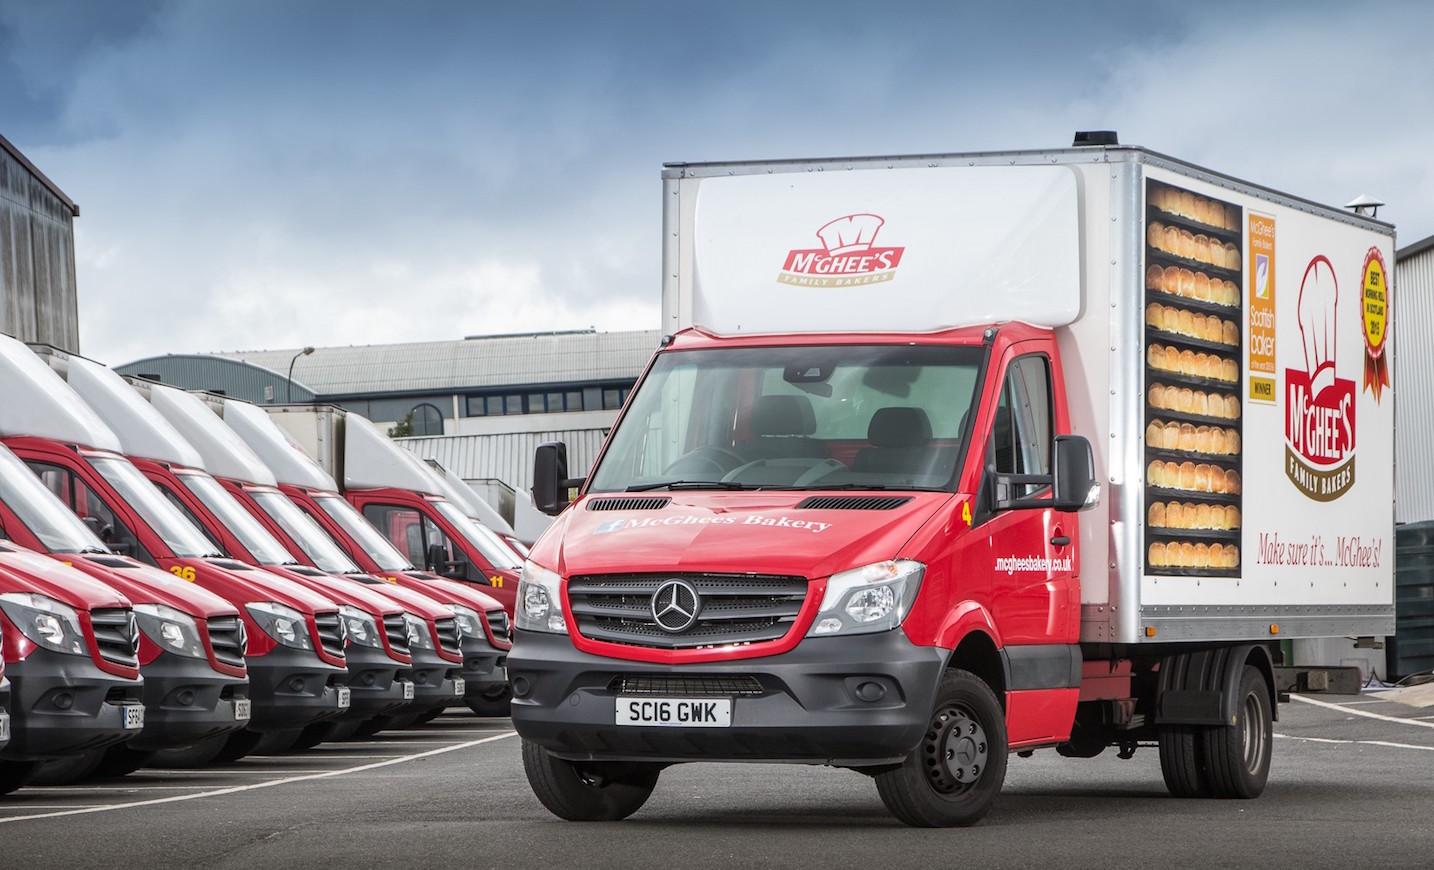 Insurance Mercedes Benz Sprinter Uk >> McGhee's Bakery is on a roll with Mercedes-Benz vans | Vans UK Haulier